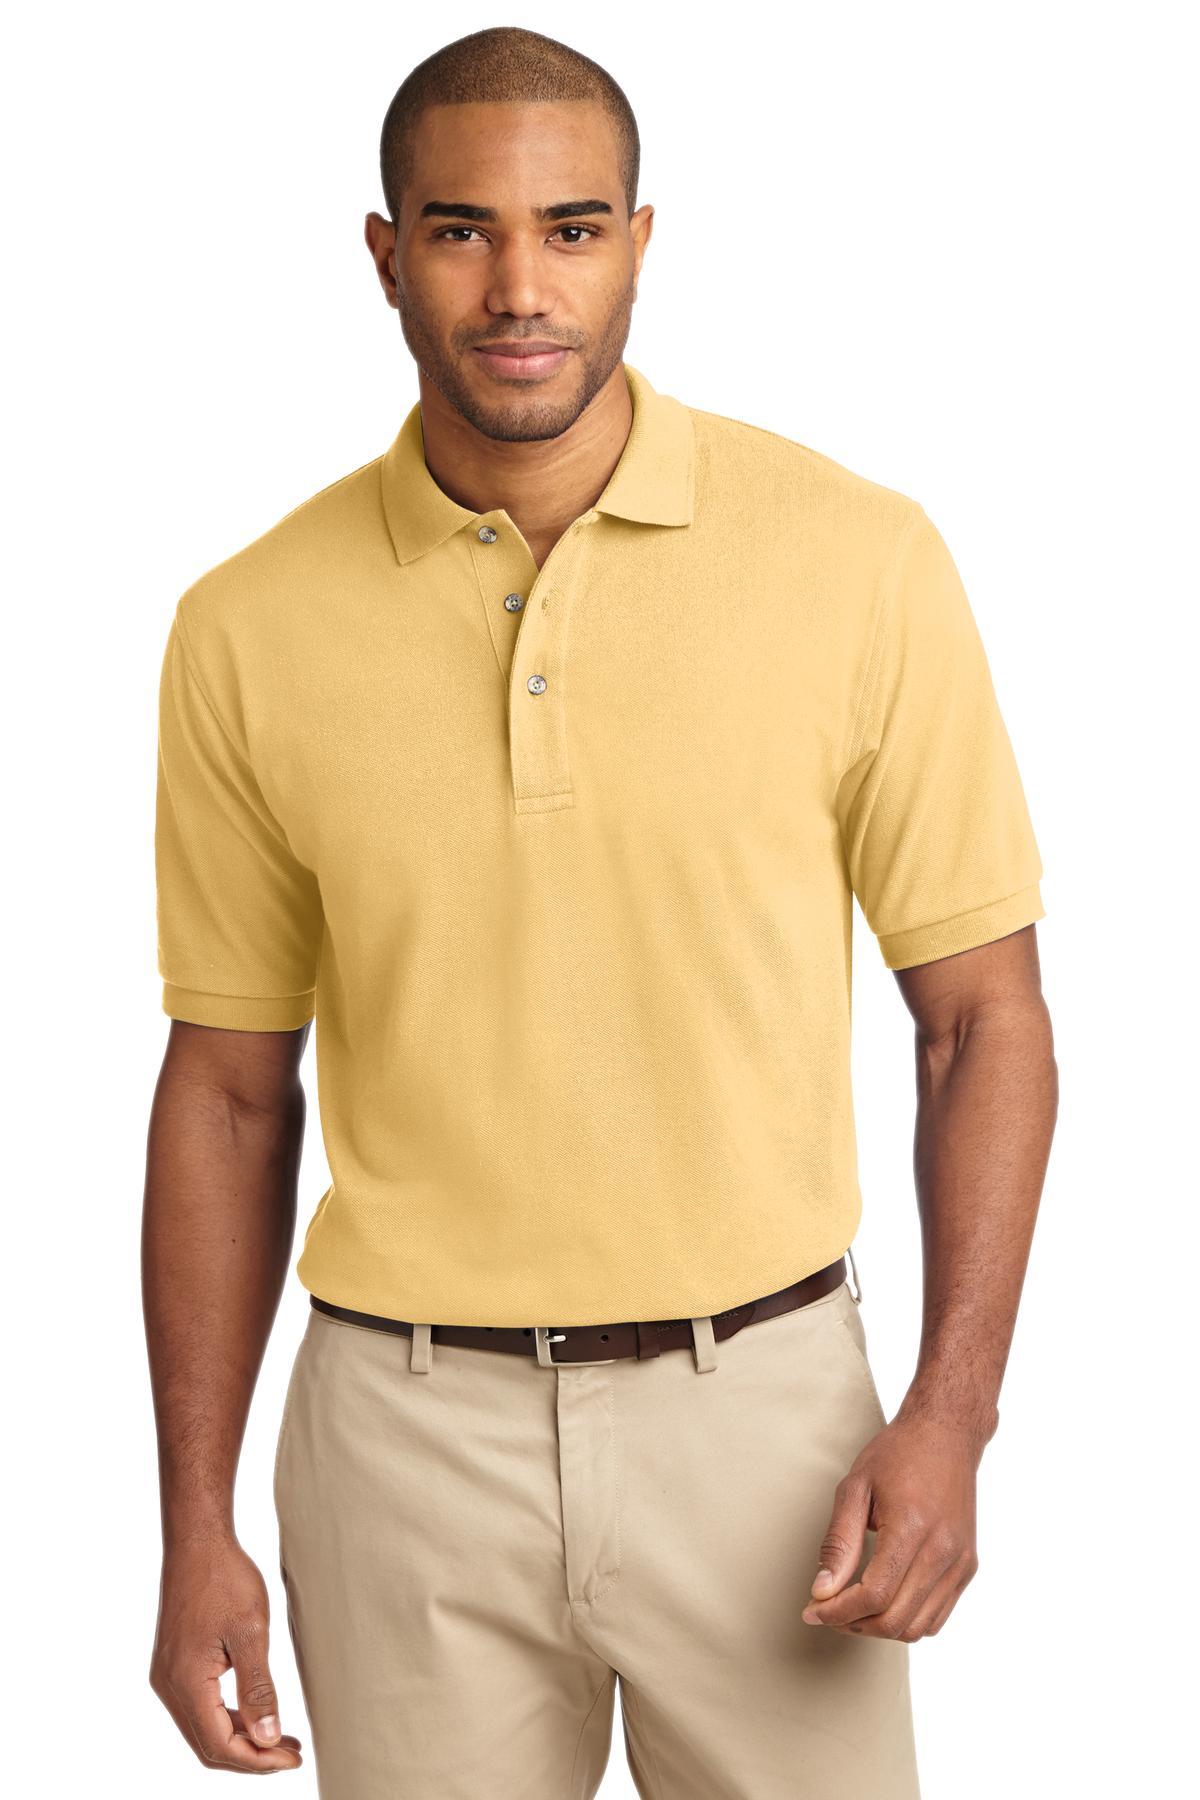 Men's HeavyWeight 100 Combed Cotton Polo Shirt   New Horizon Trading